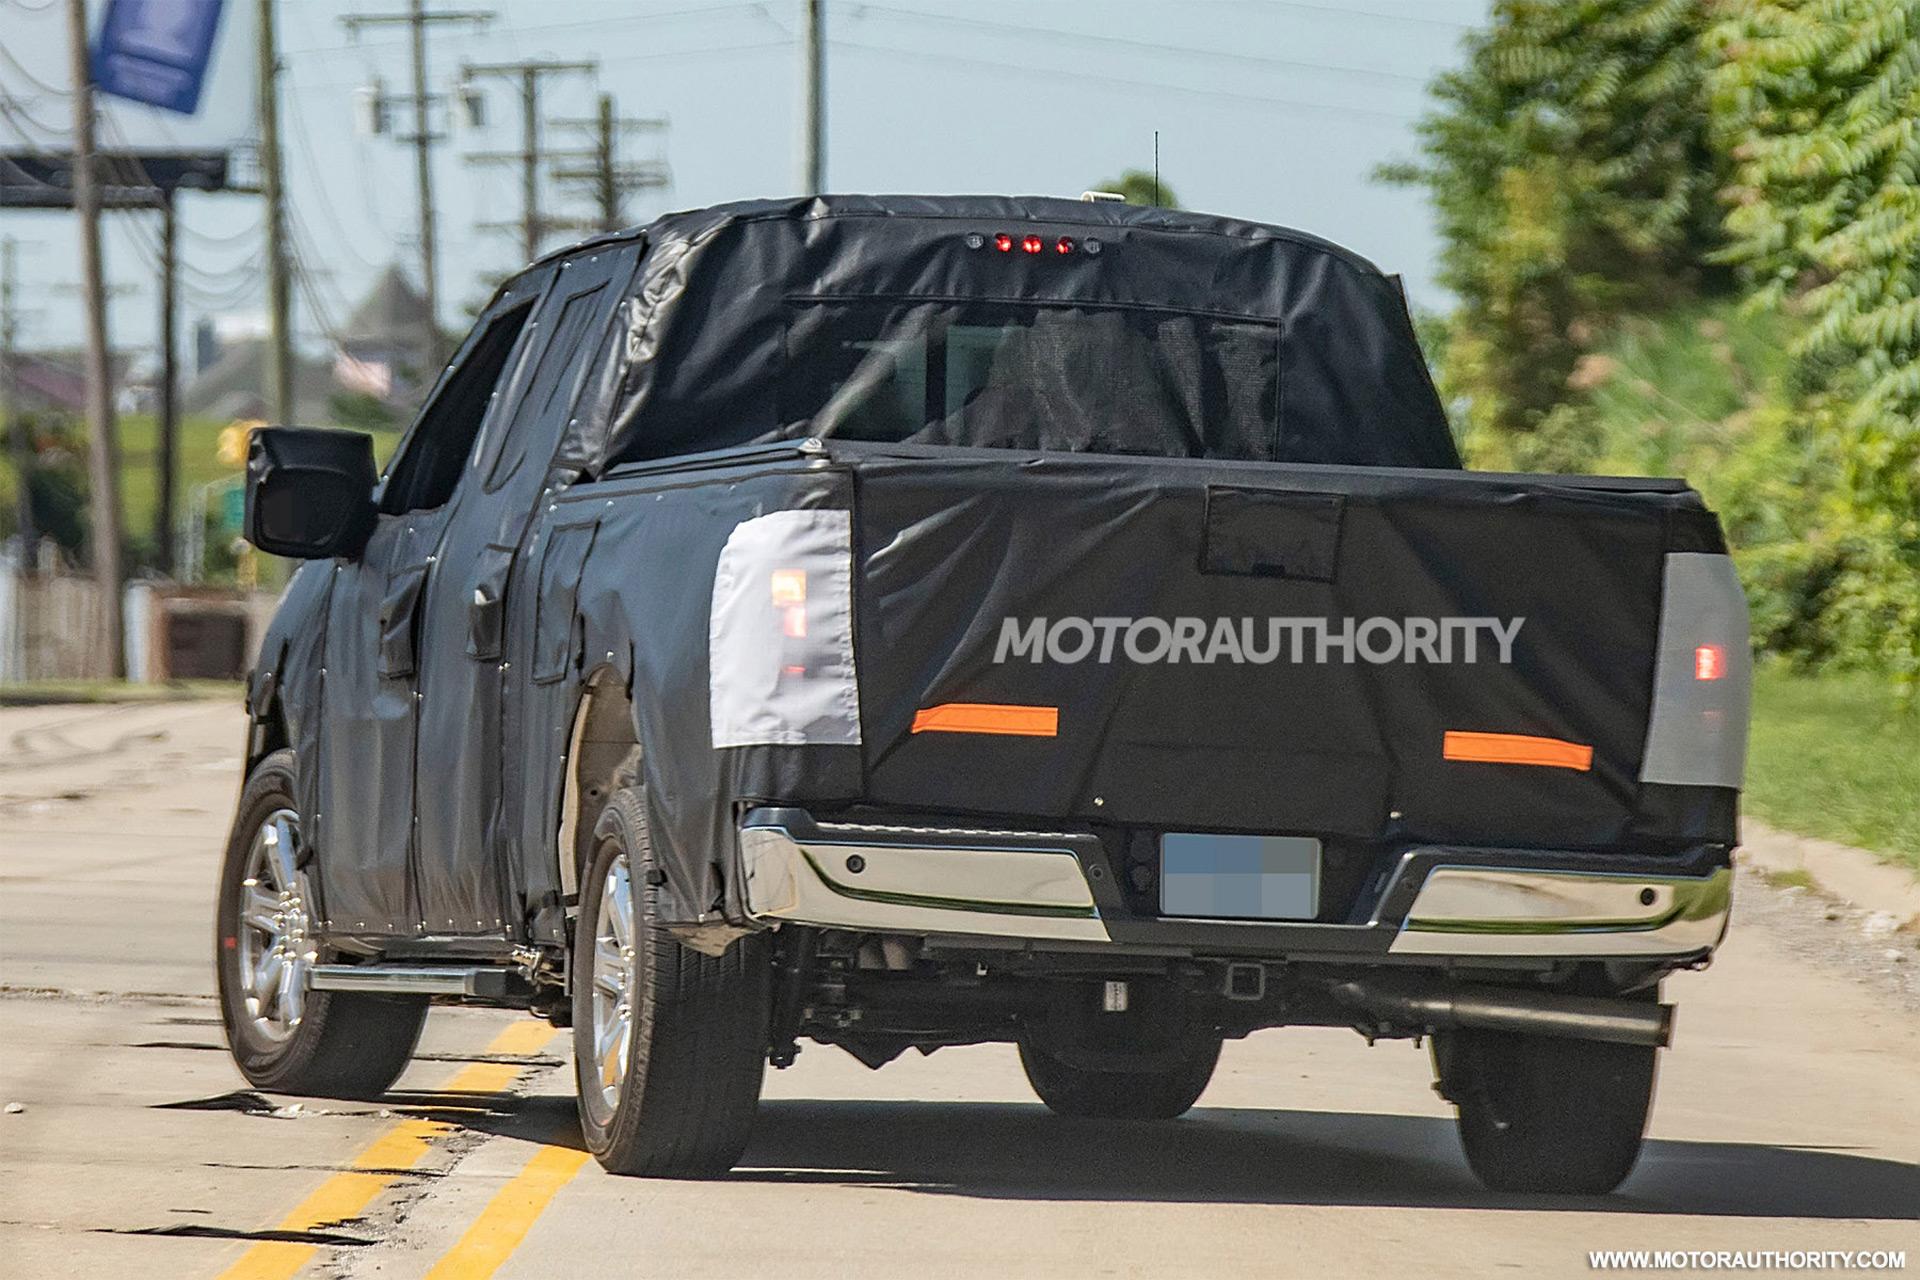 2020 - [Ford] F-Series 2021-ford-f-150-spy-shots--image-via-s-baldauf-sb-medien_100710868_h